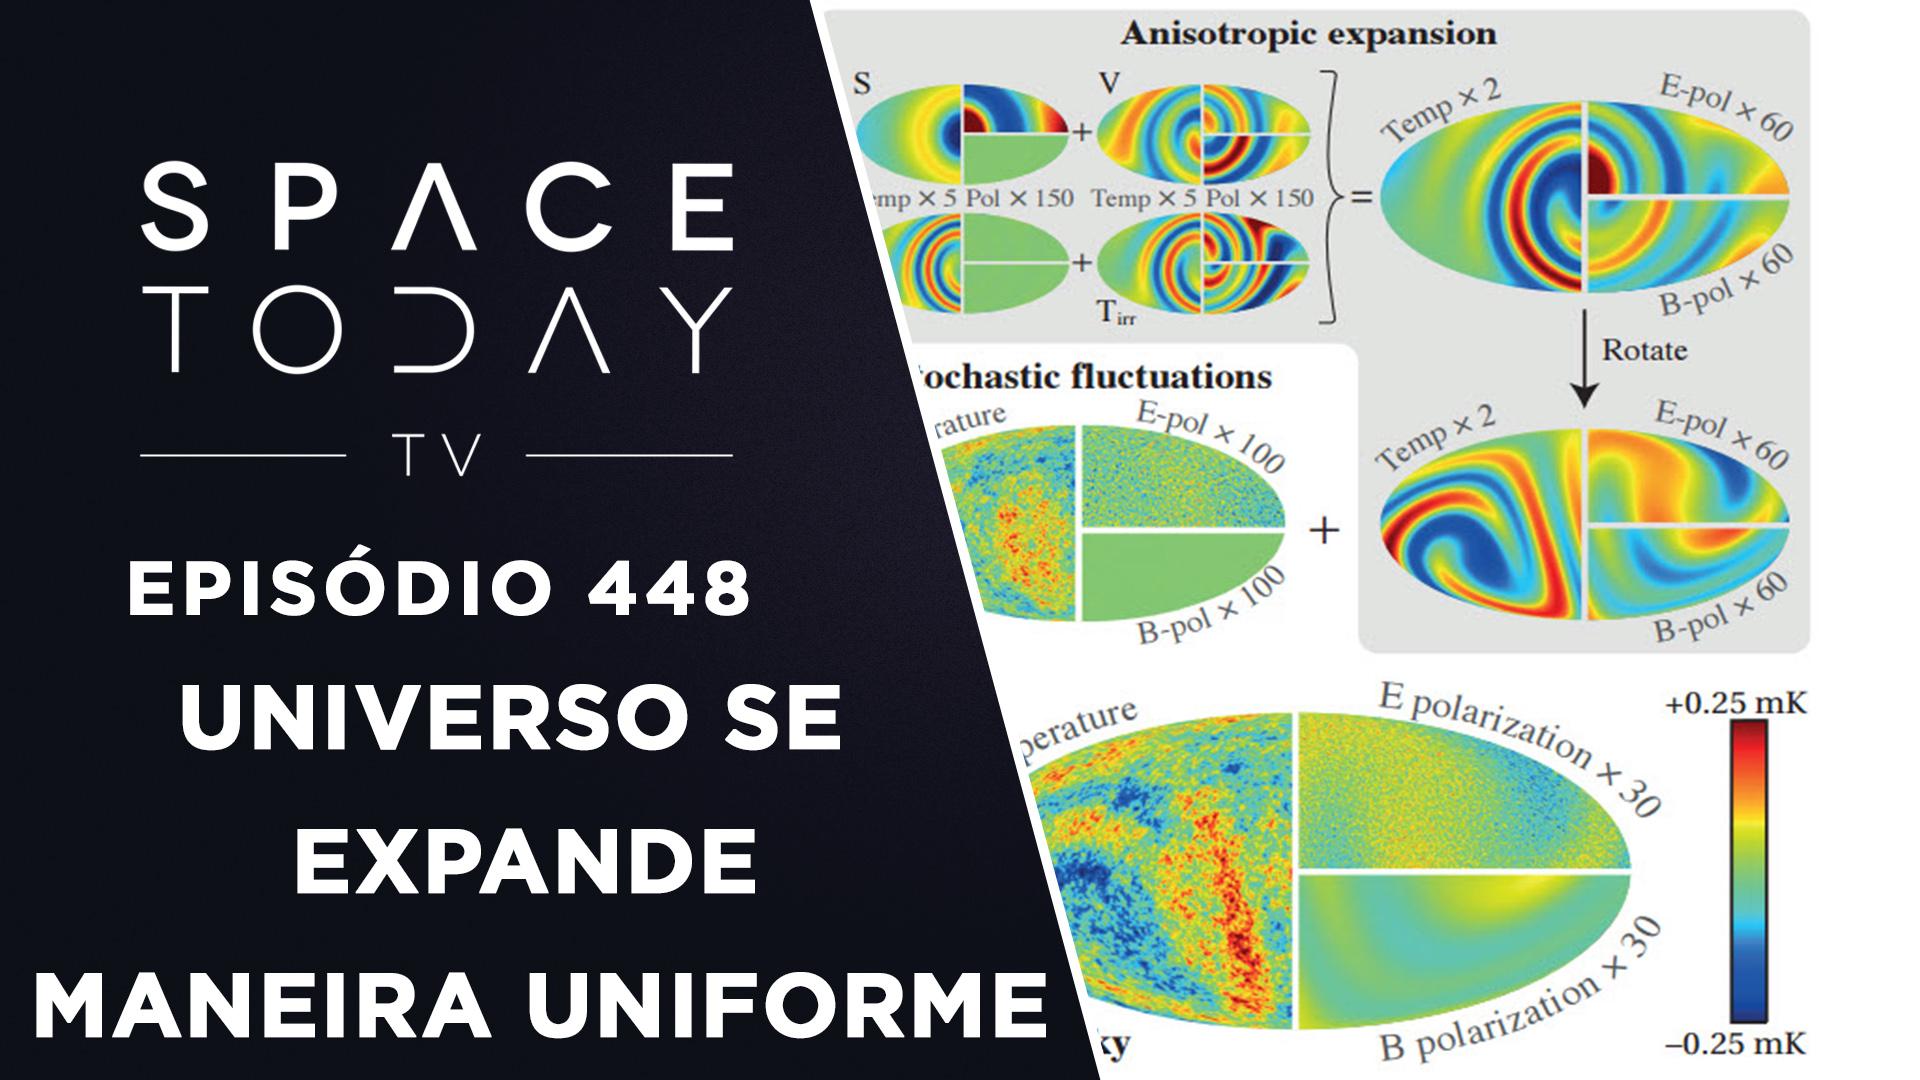 O Universo Se Expande de Maneira Uniforme – Space Today TV Ep.448